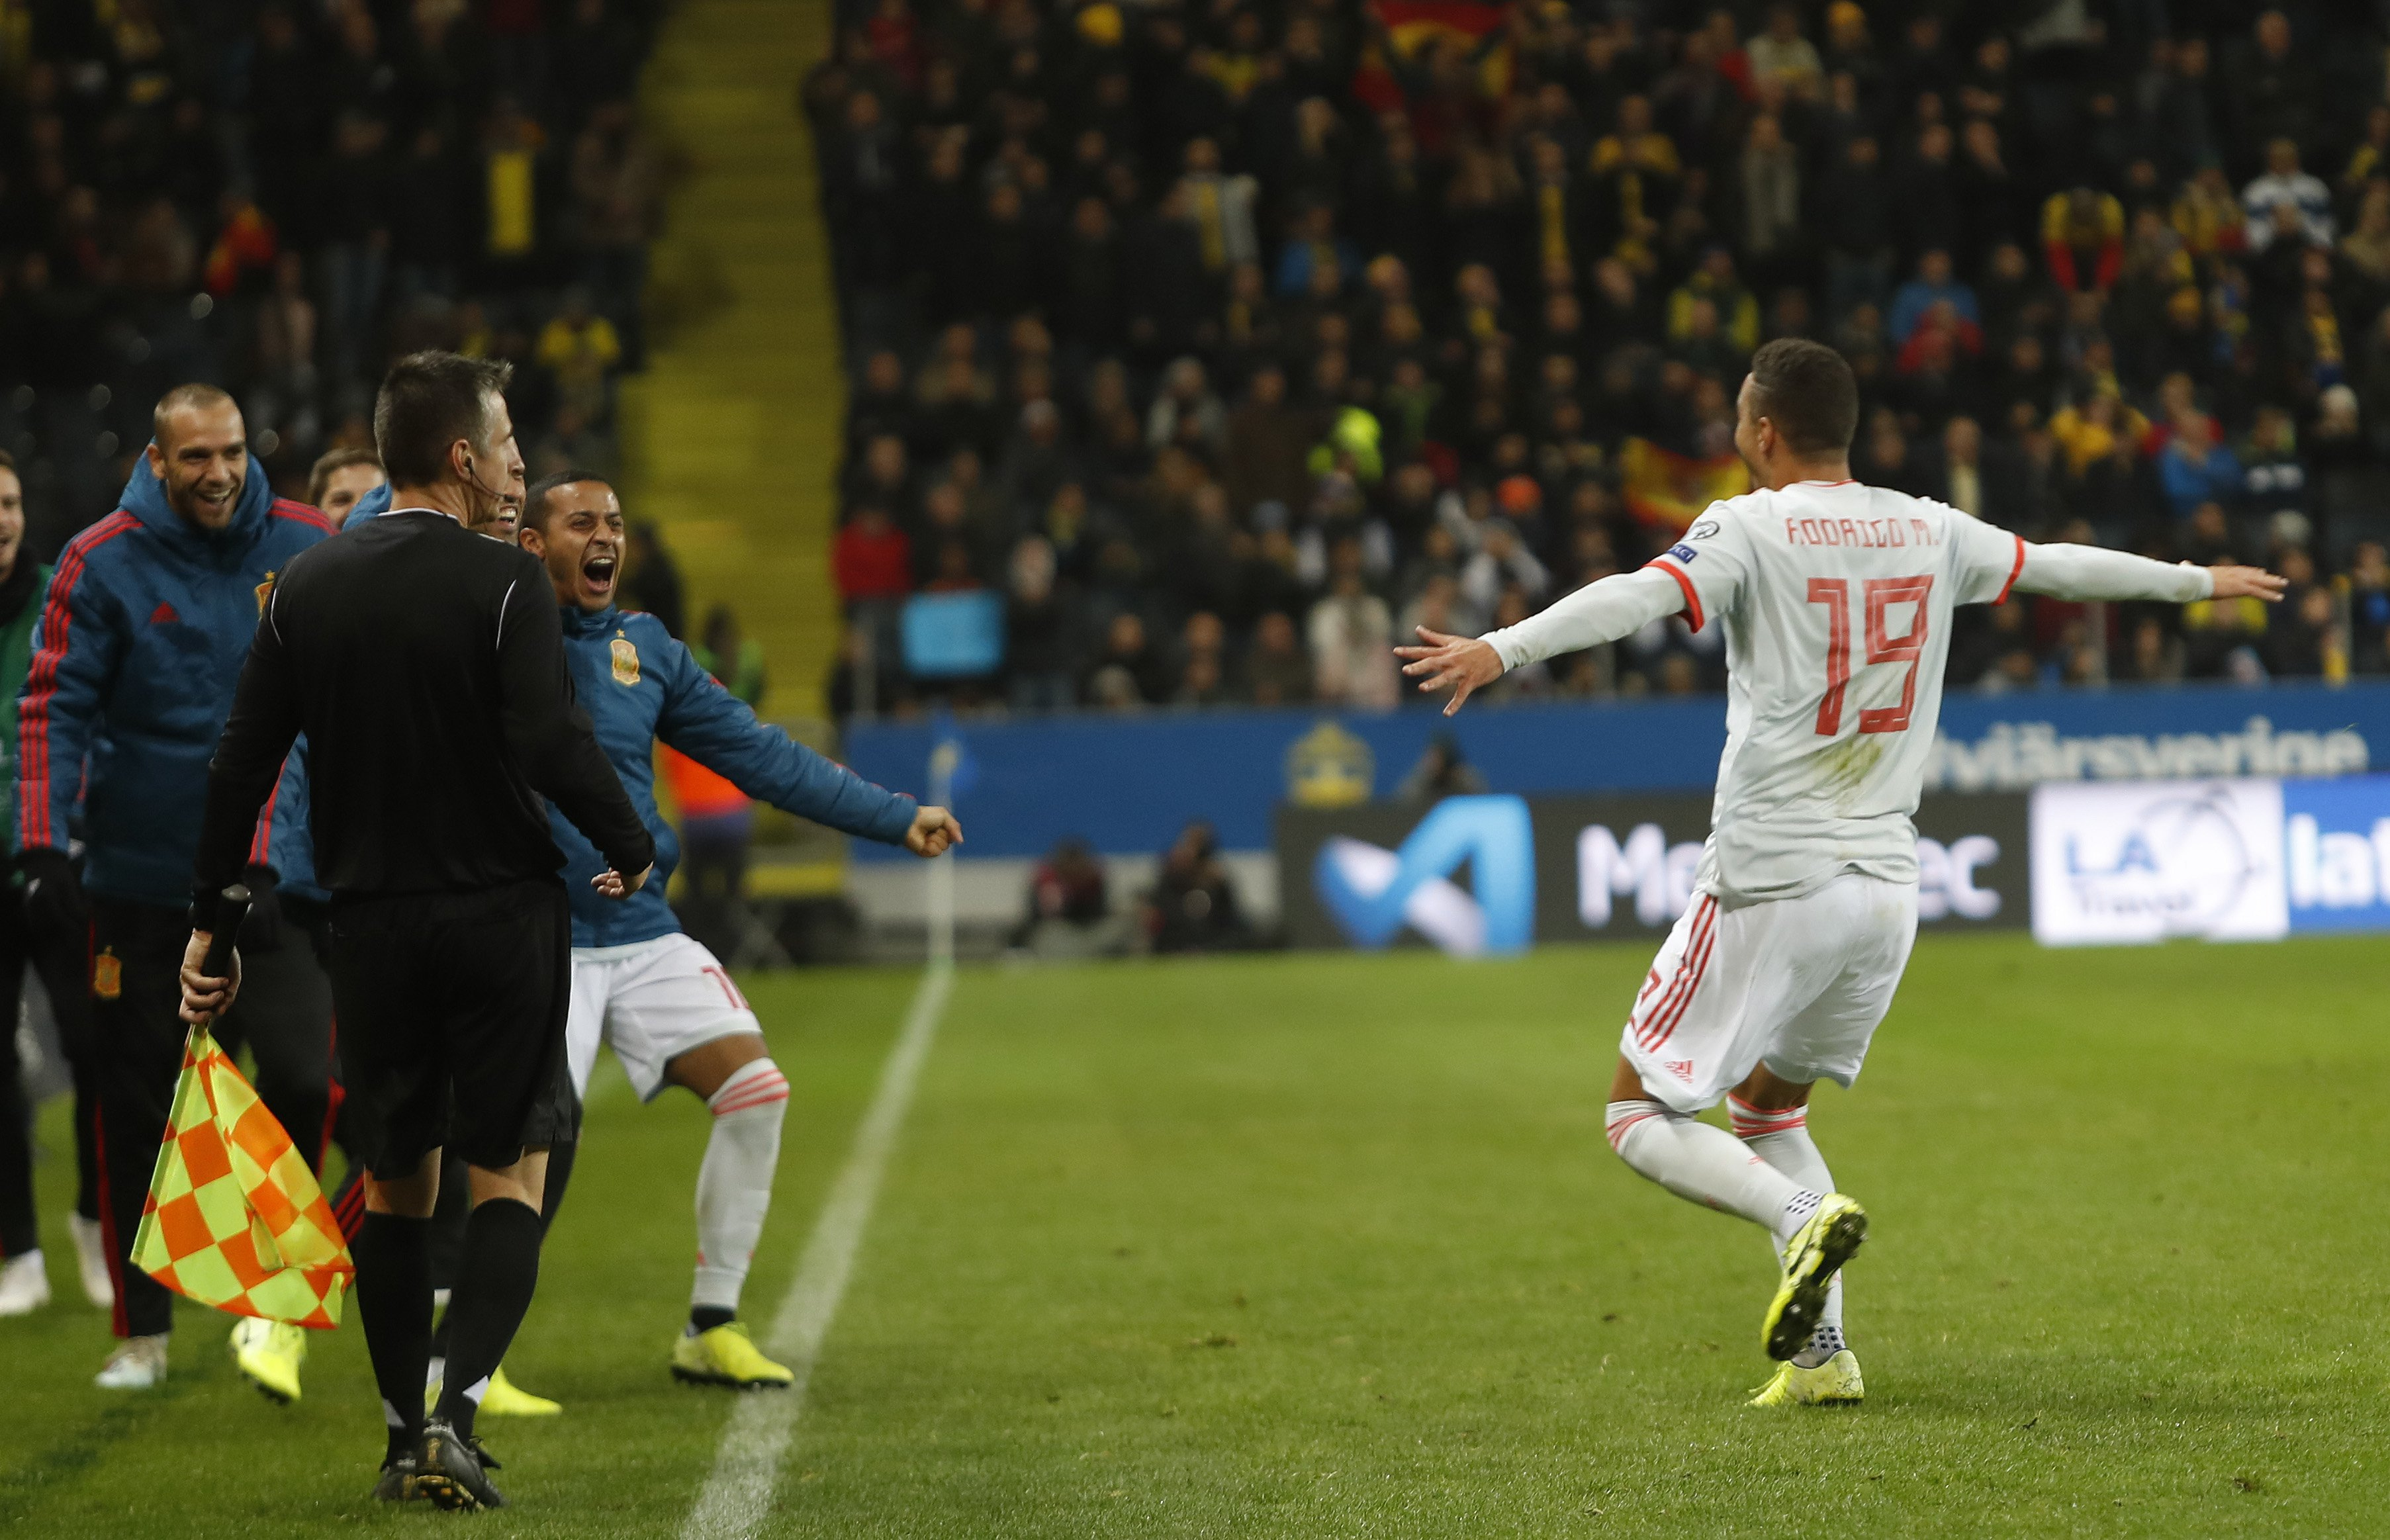 Rodrigo celebrando el gol con Thiago